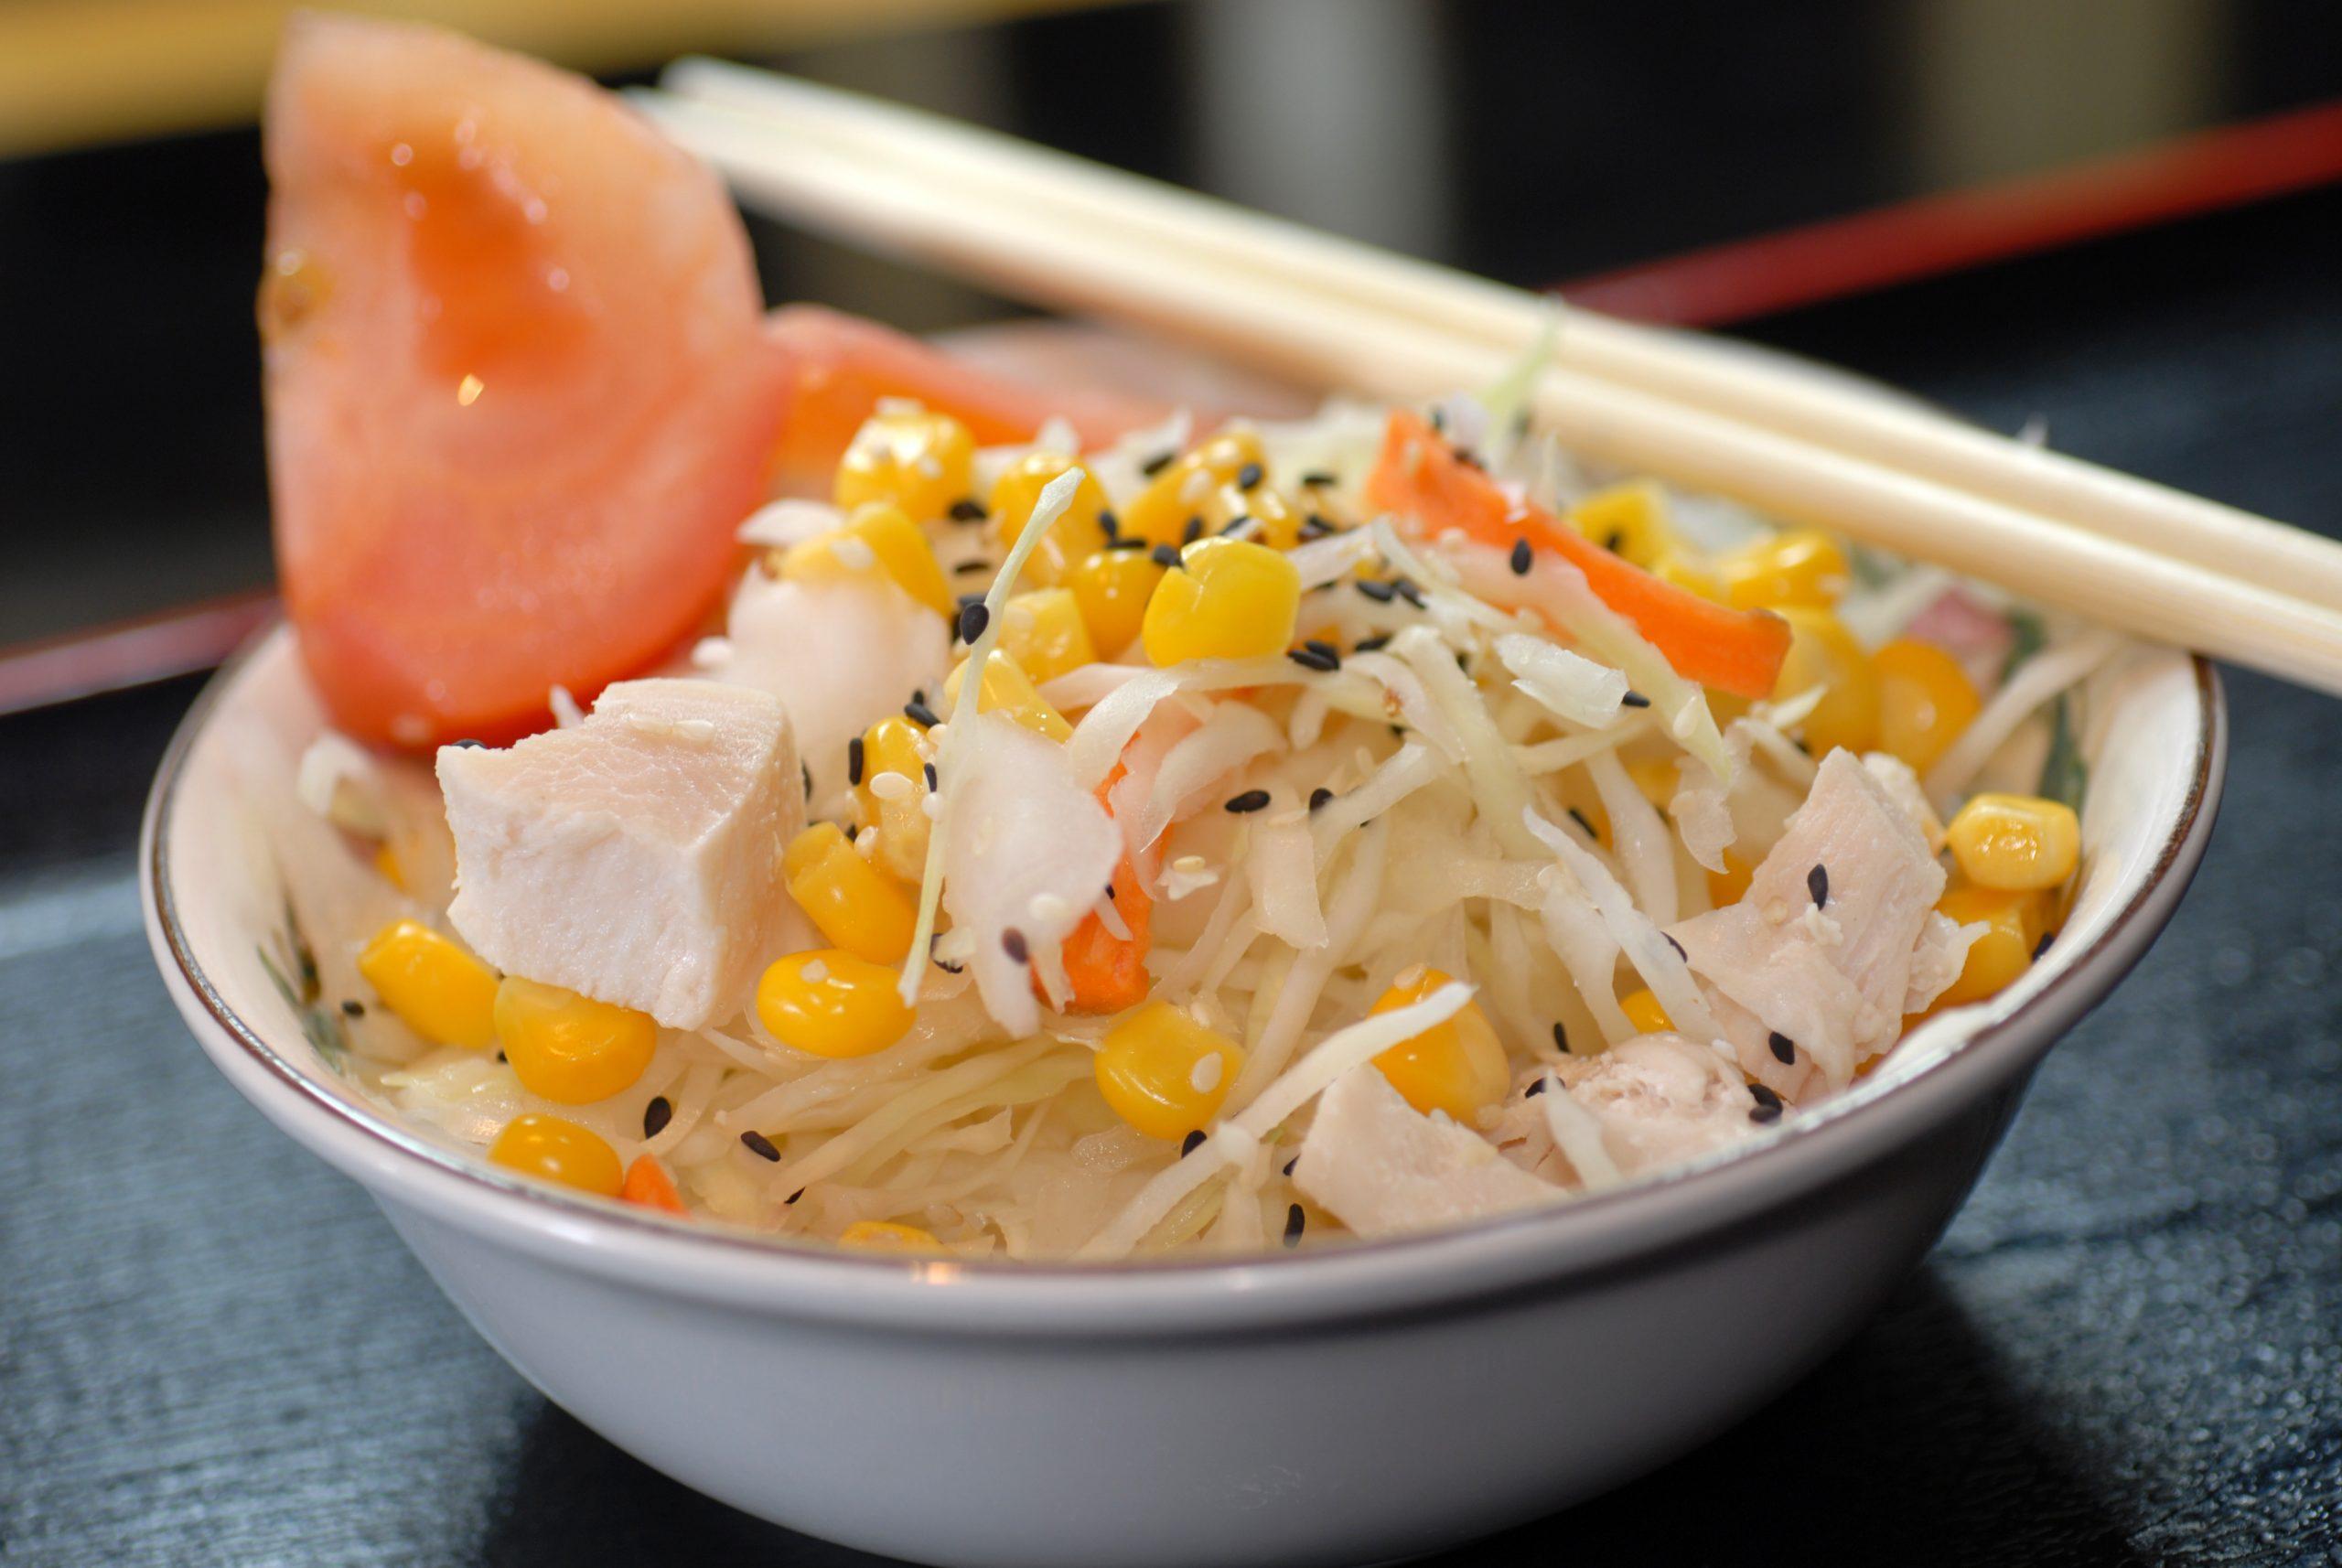 krautsalat-mit-tofu-mais-und-karotten